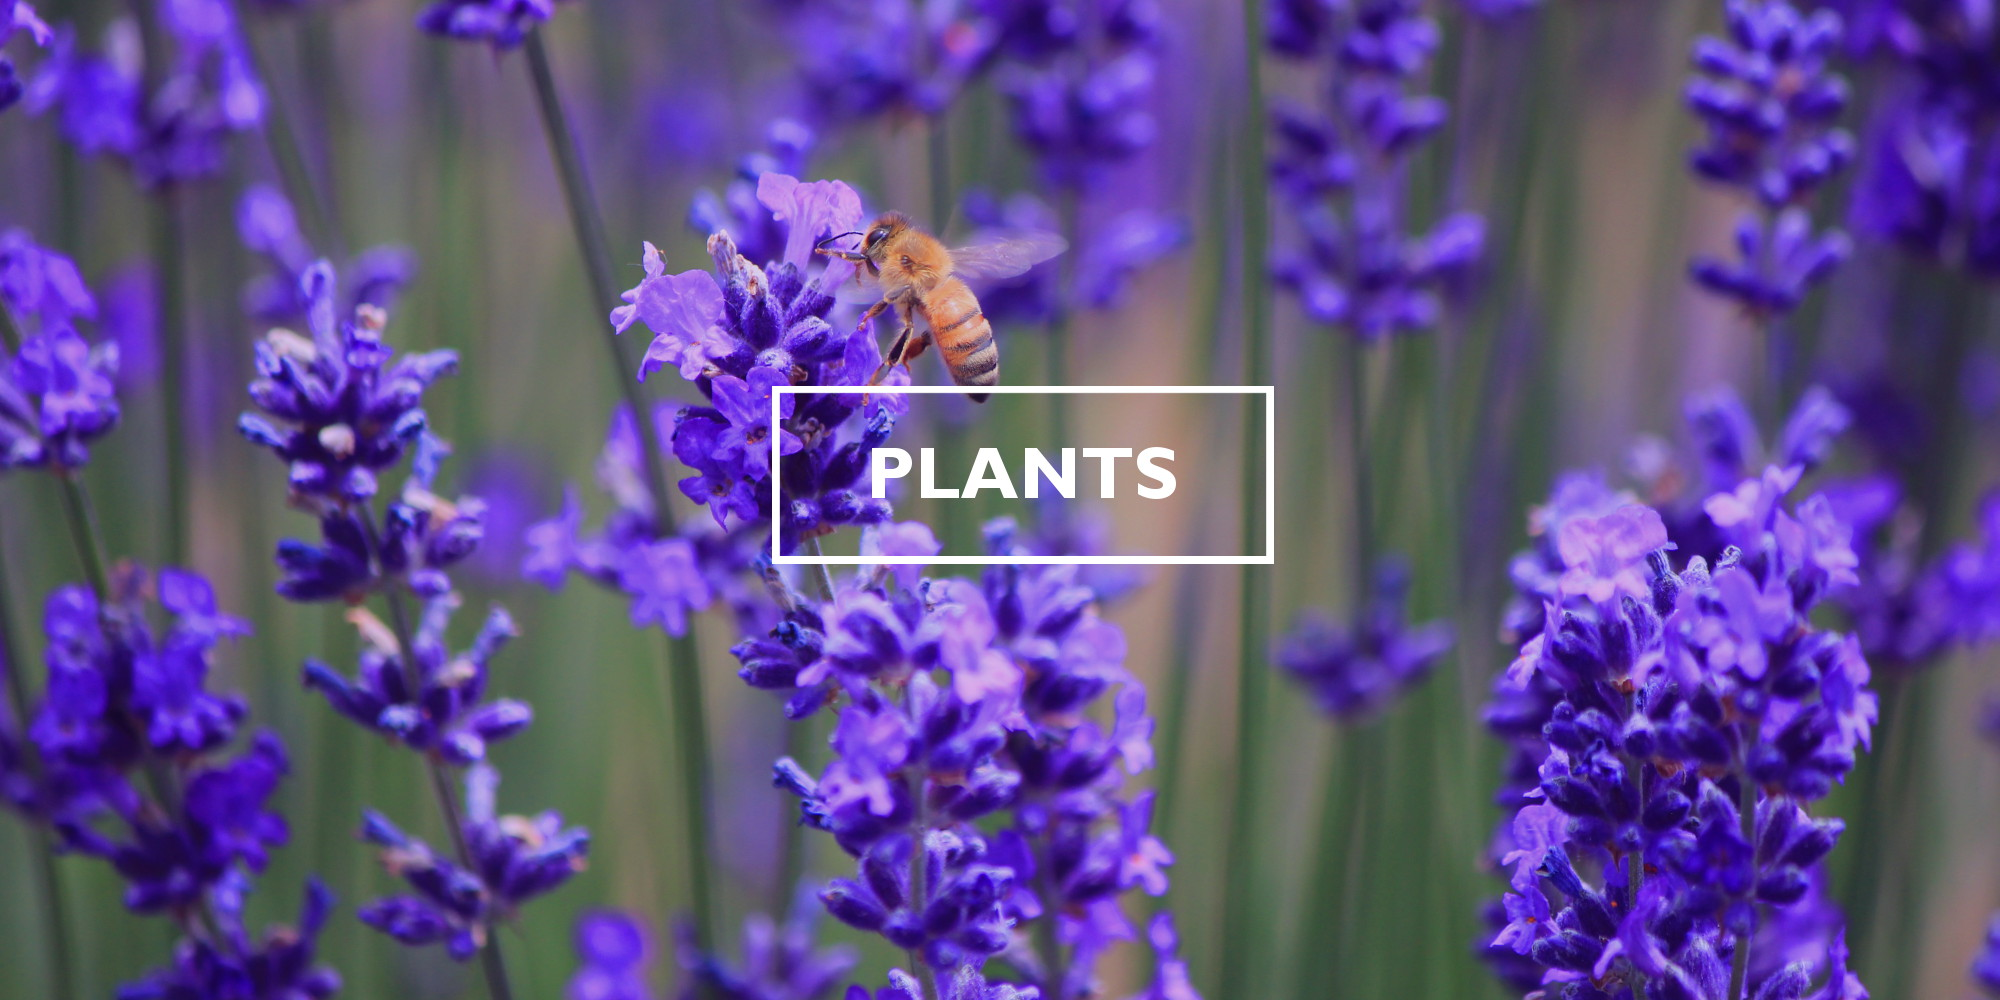 Botany - Wikipedia